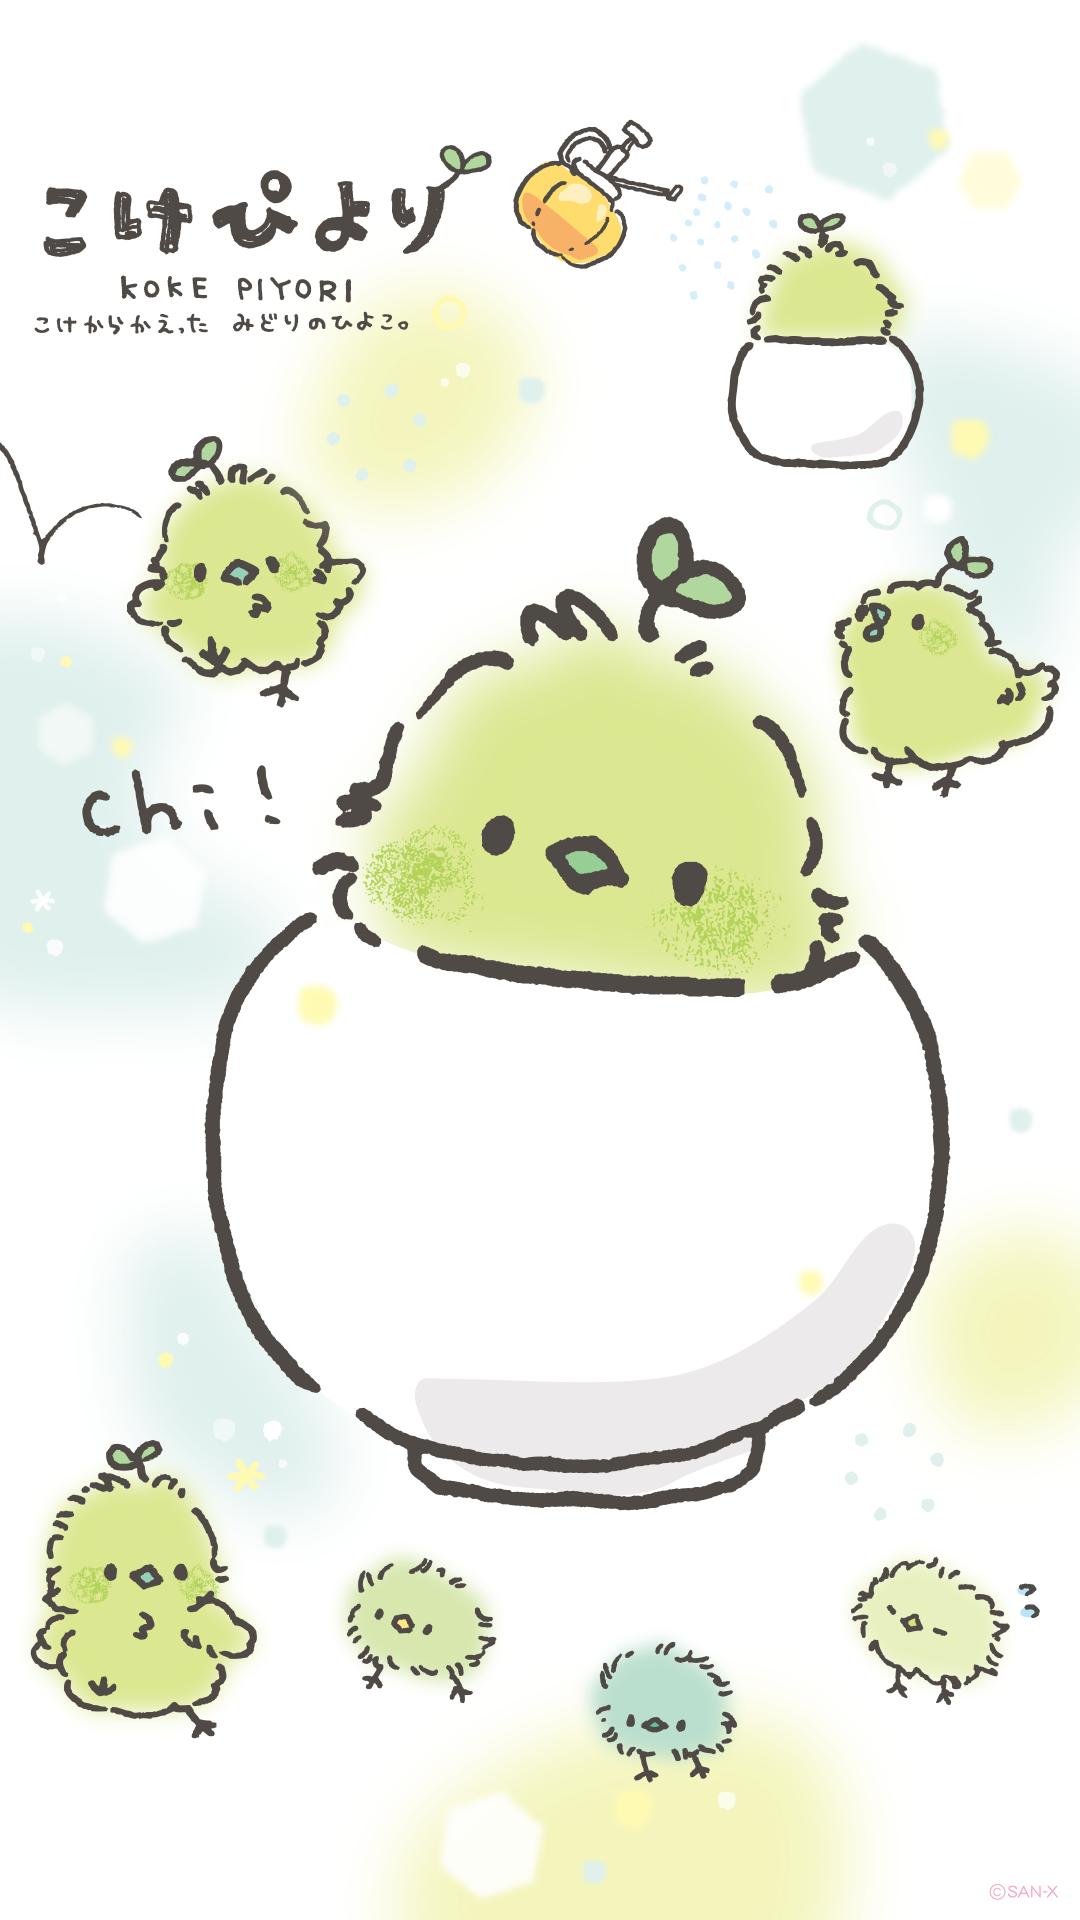 Birb fid green bird baby parrot Kawaii illustration Cute 1080x1920